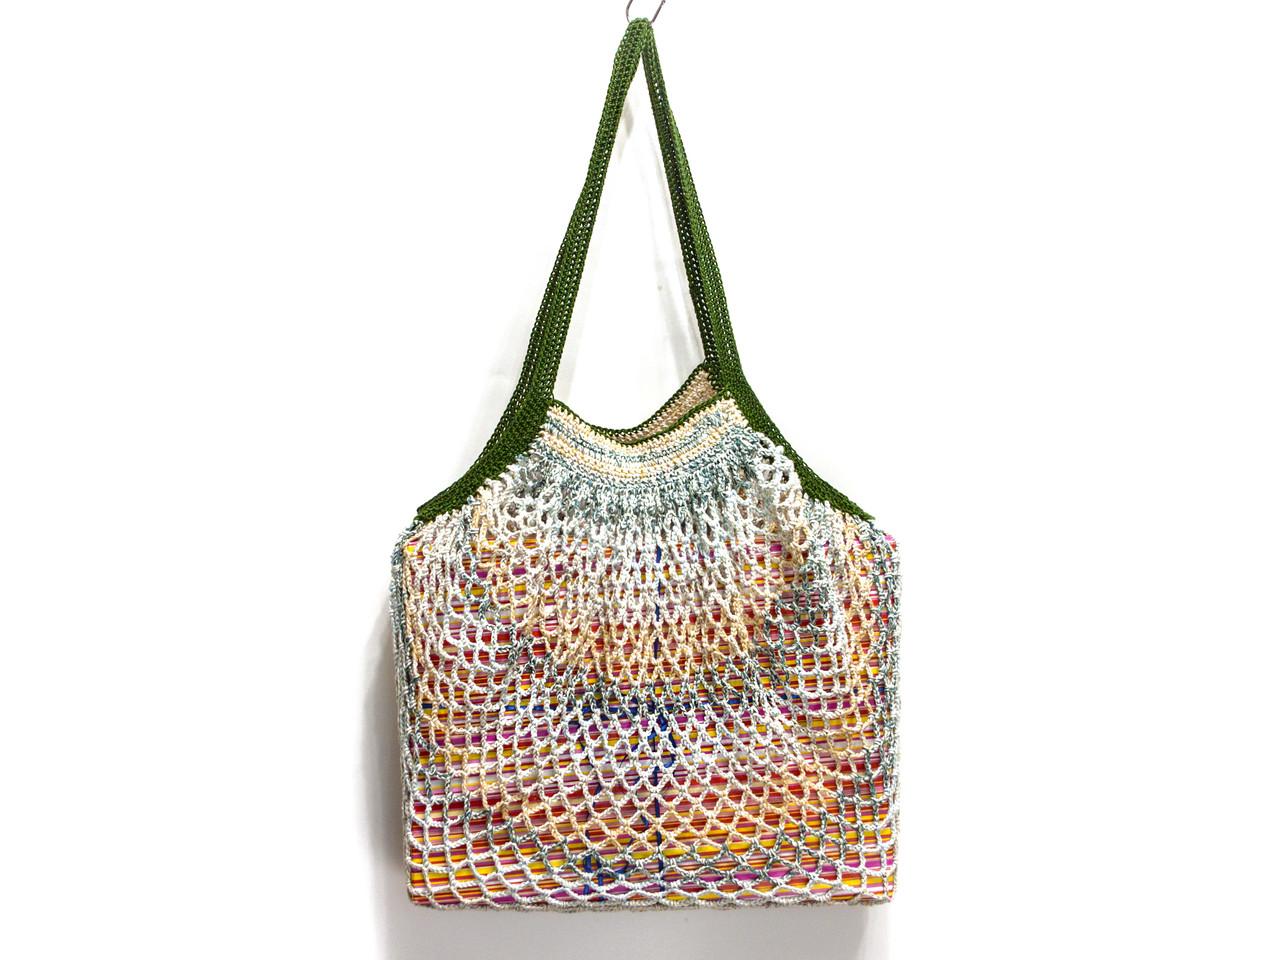 Вязаная крючком сумка - Хиппи сумка - Сумка на плечо